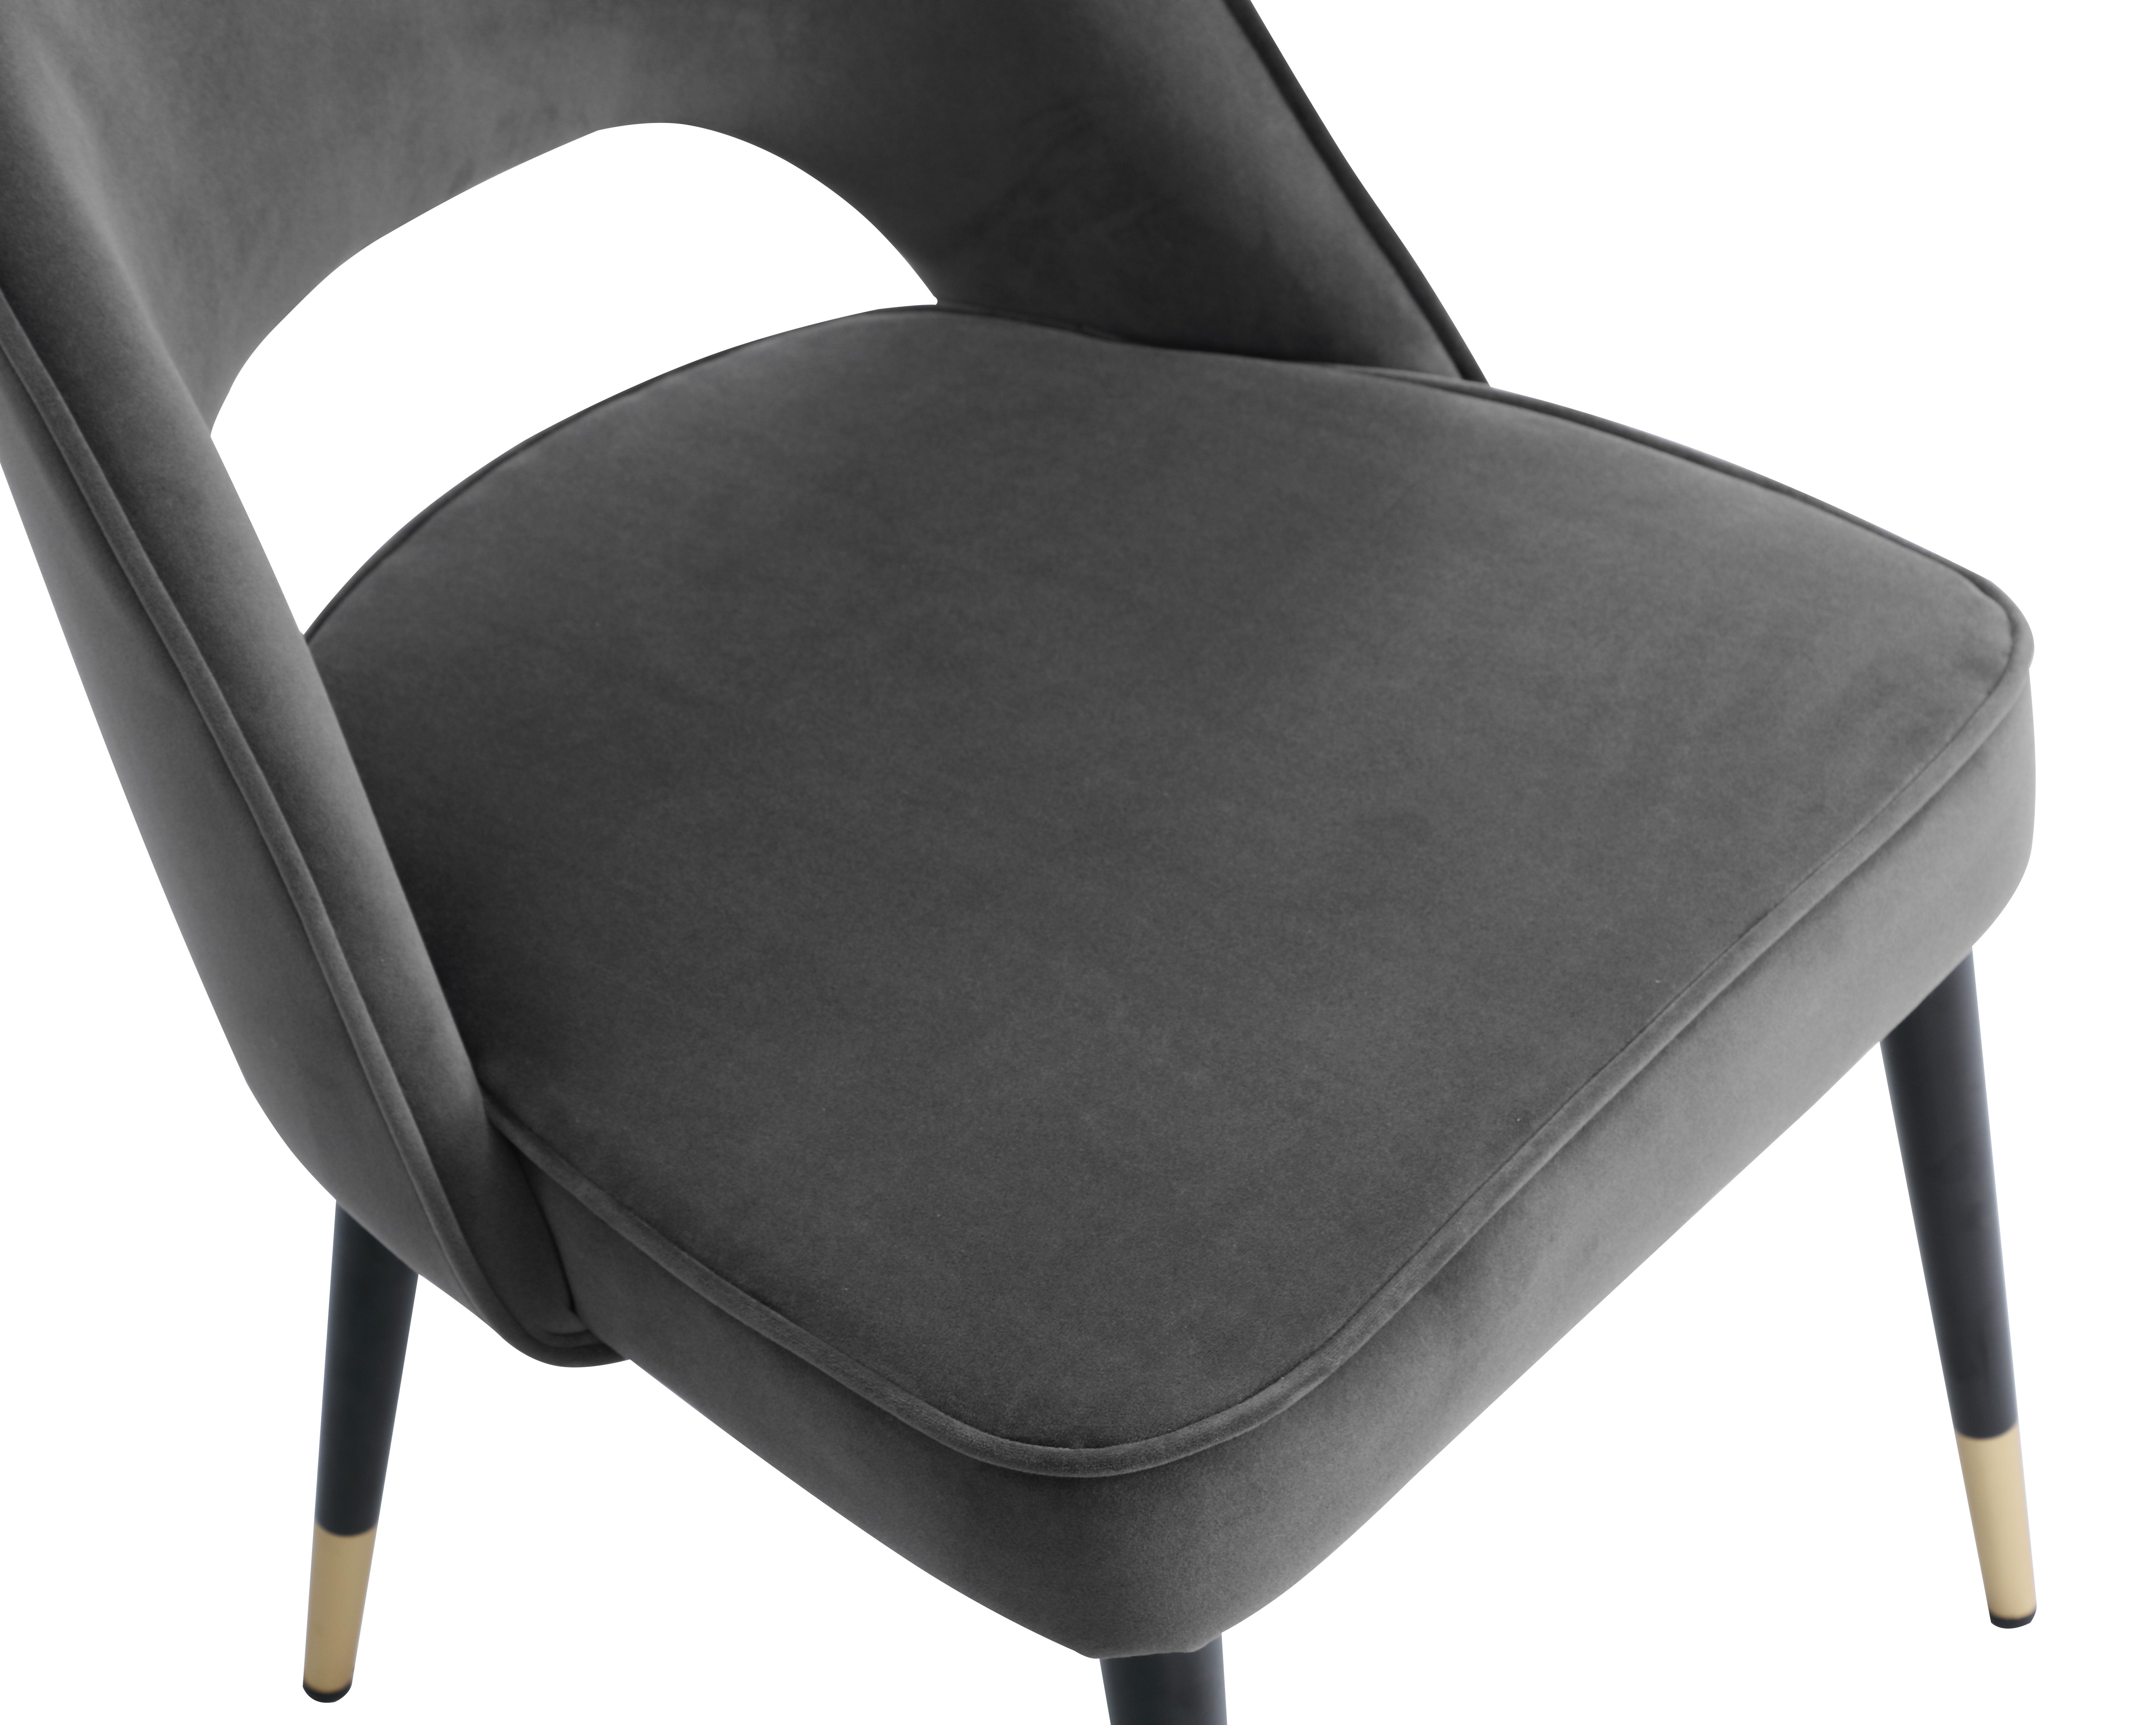 Liang & Eimil GV-DCH-007 Yvees Chair (4)